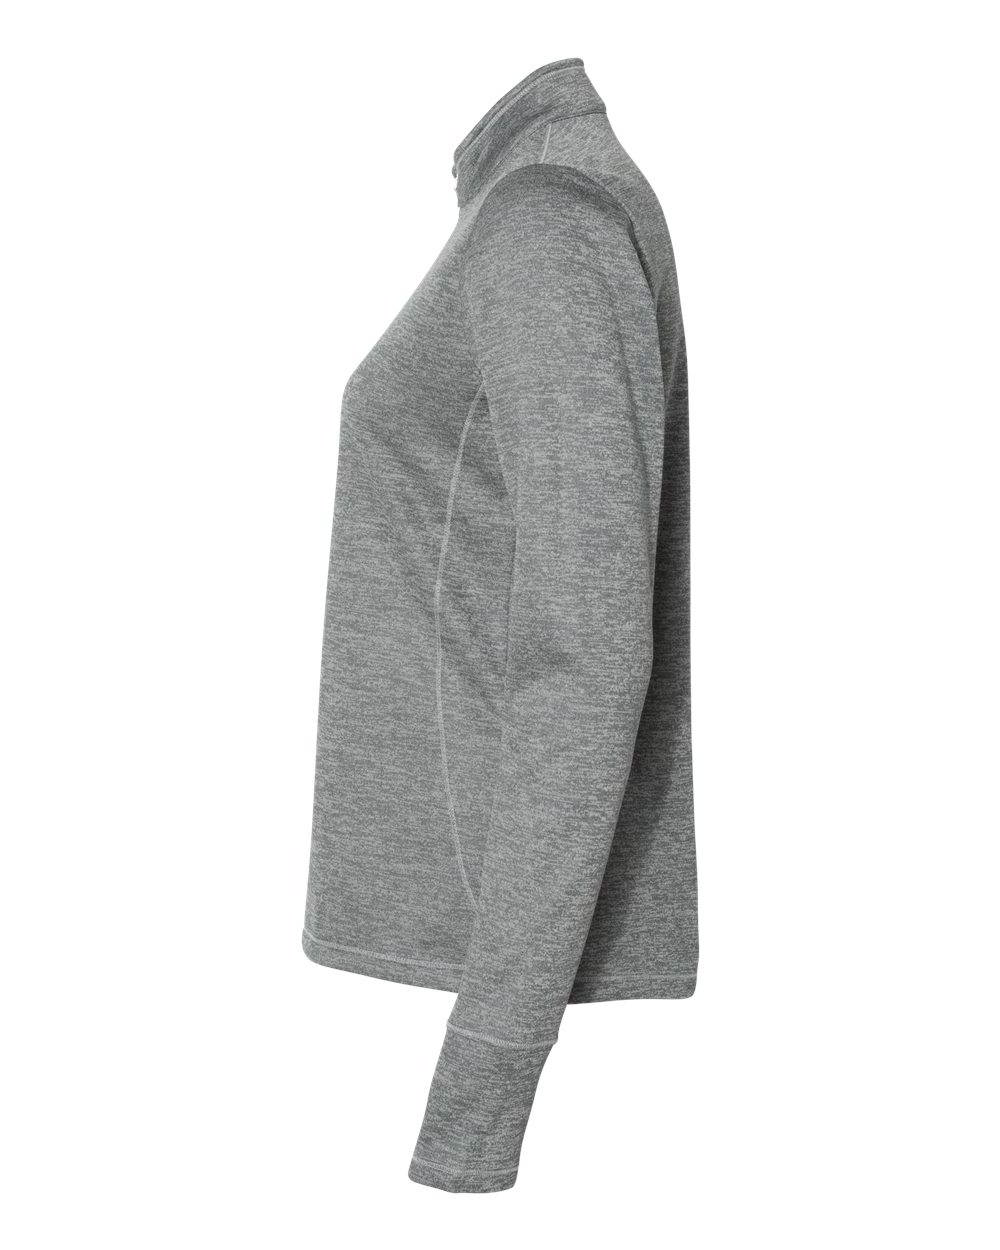 Adidas Women's Women's Women's Brushed Terry Heather Quarter-Zip Sweatshirt - A285 dff98d